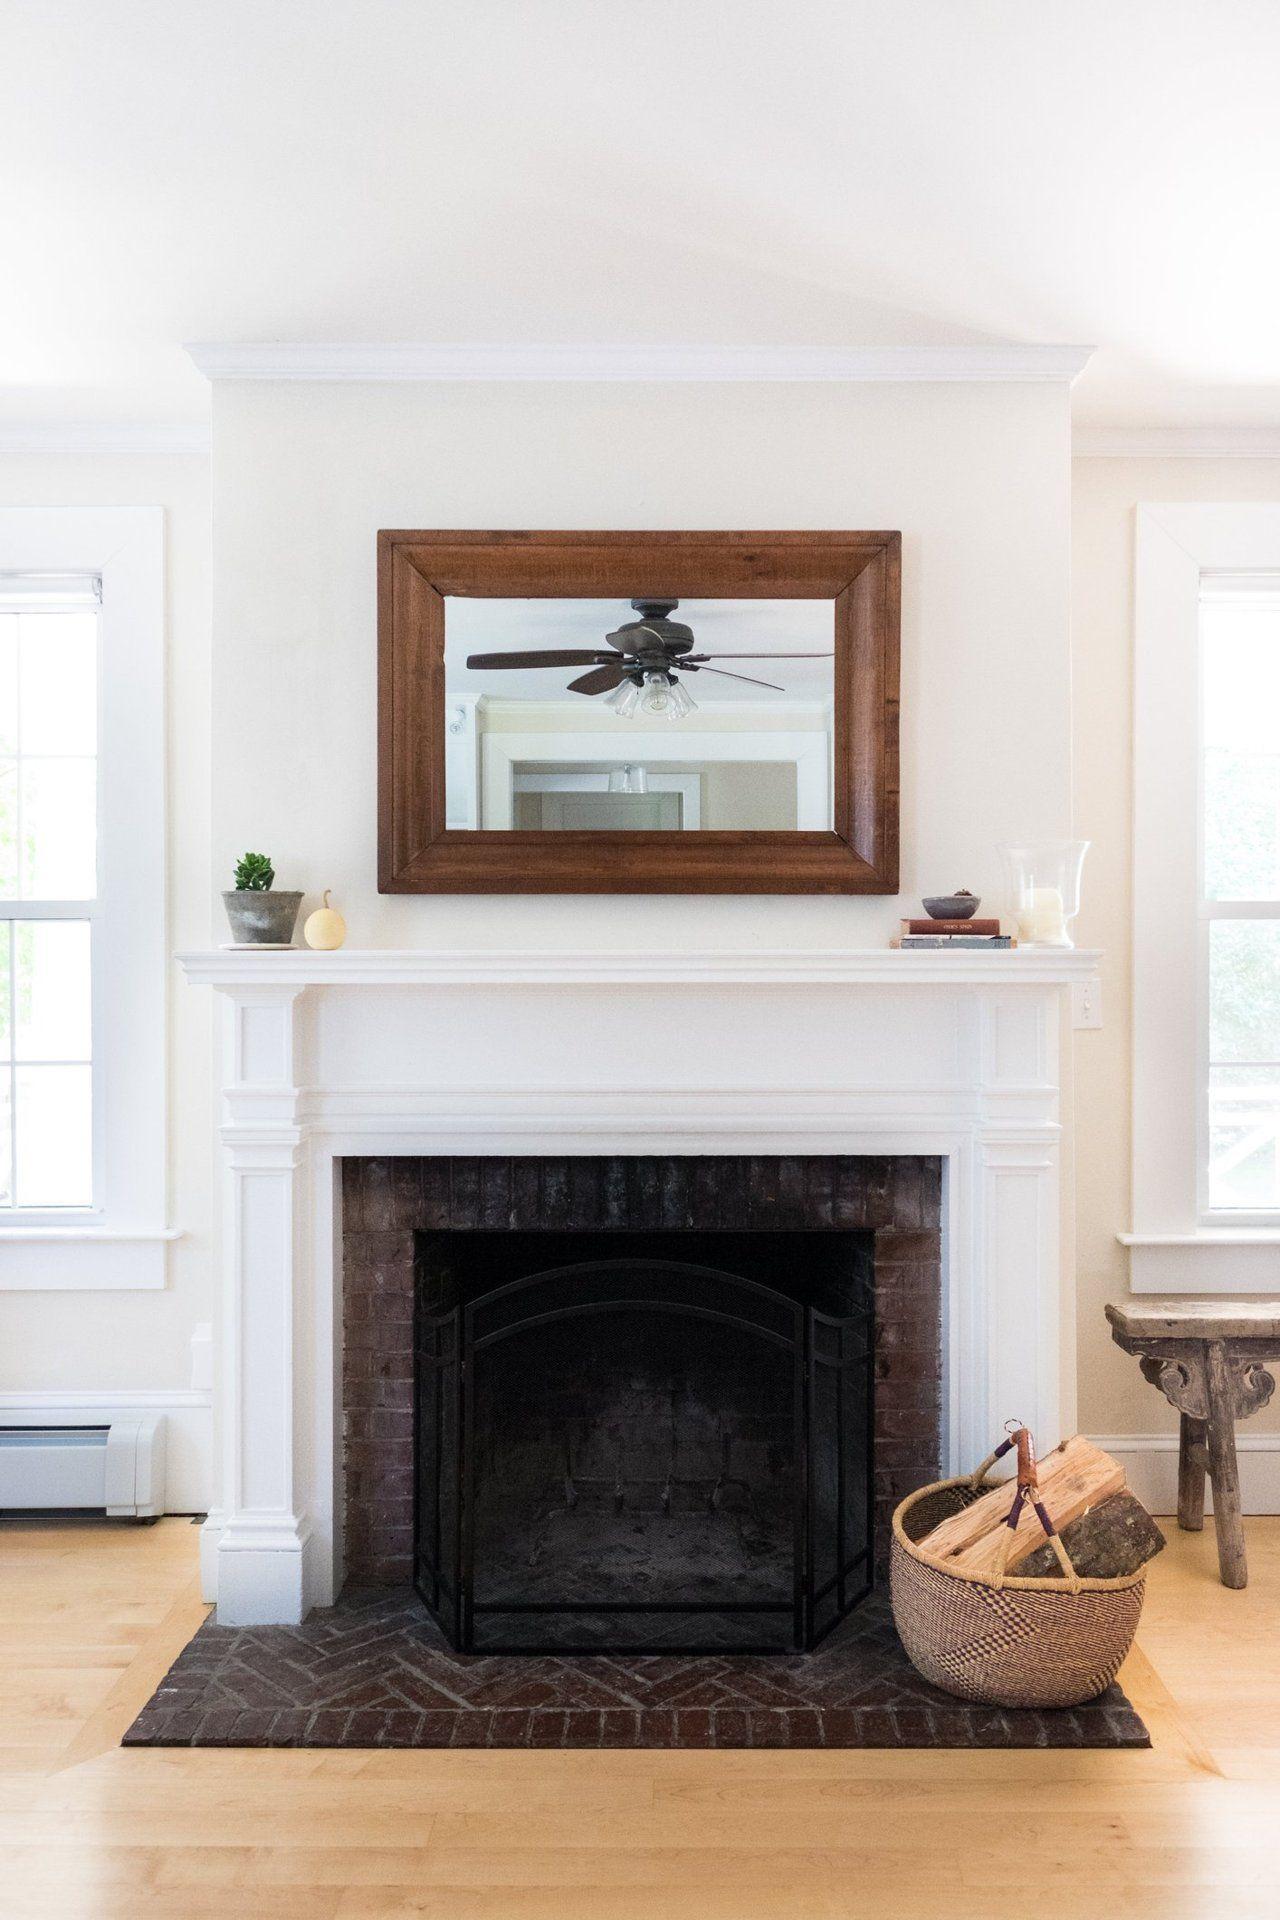 House tour amy u peterus minimalist home traditional fireplace